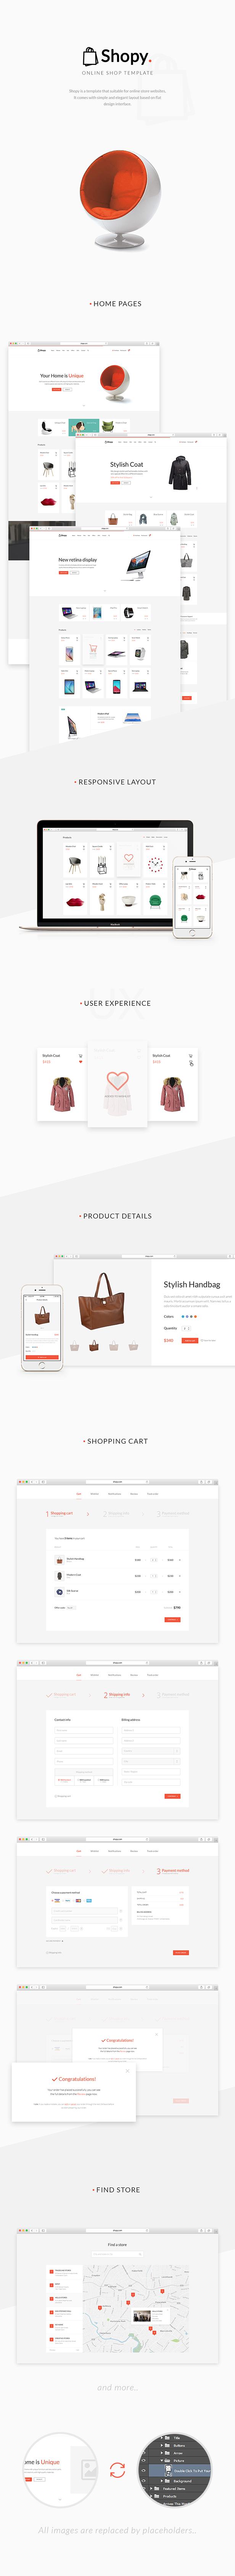 Shopy - Ecommerce WordPress Theme - 5